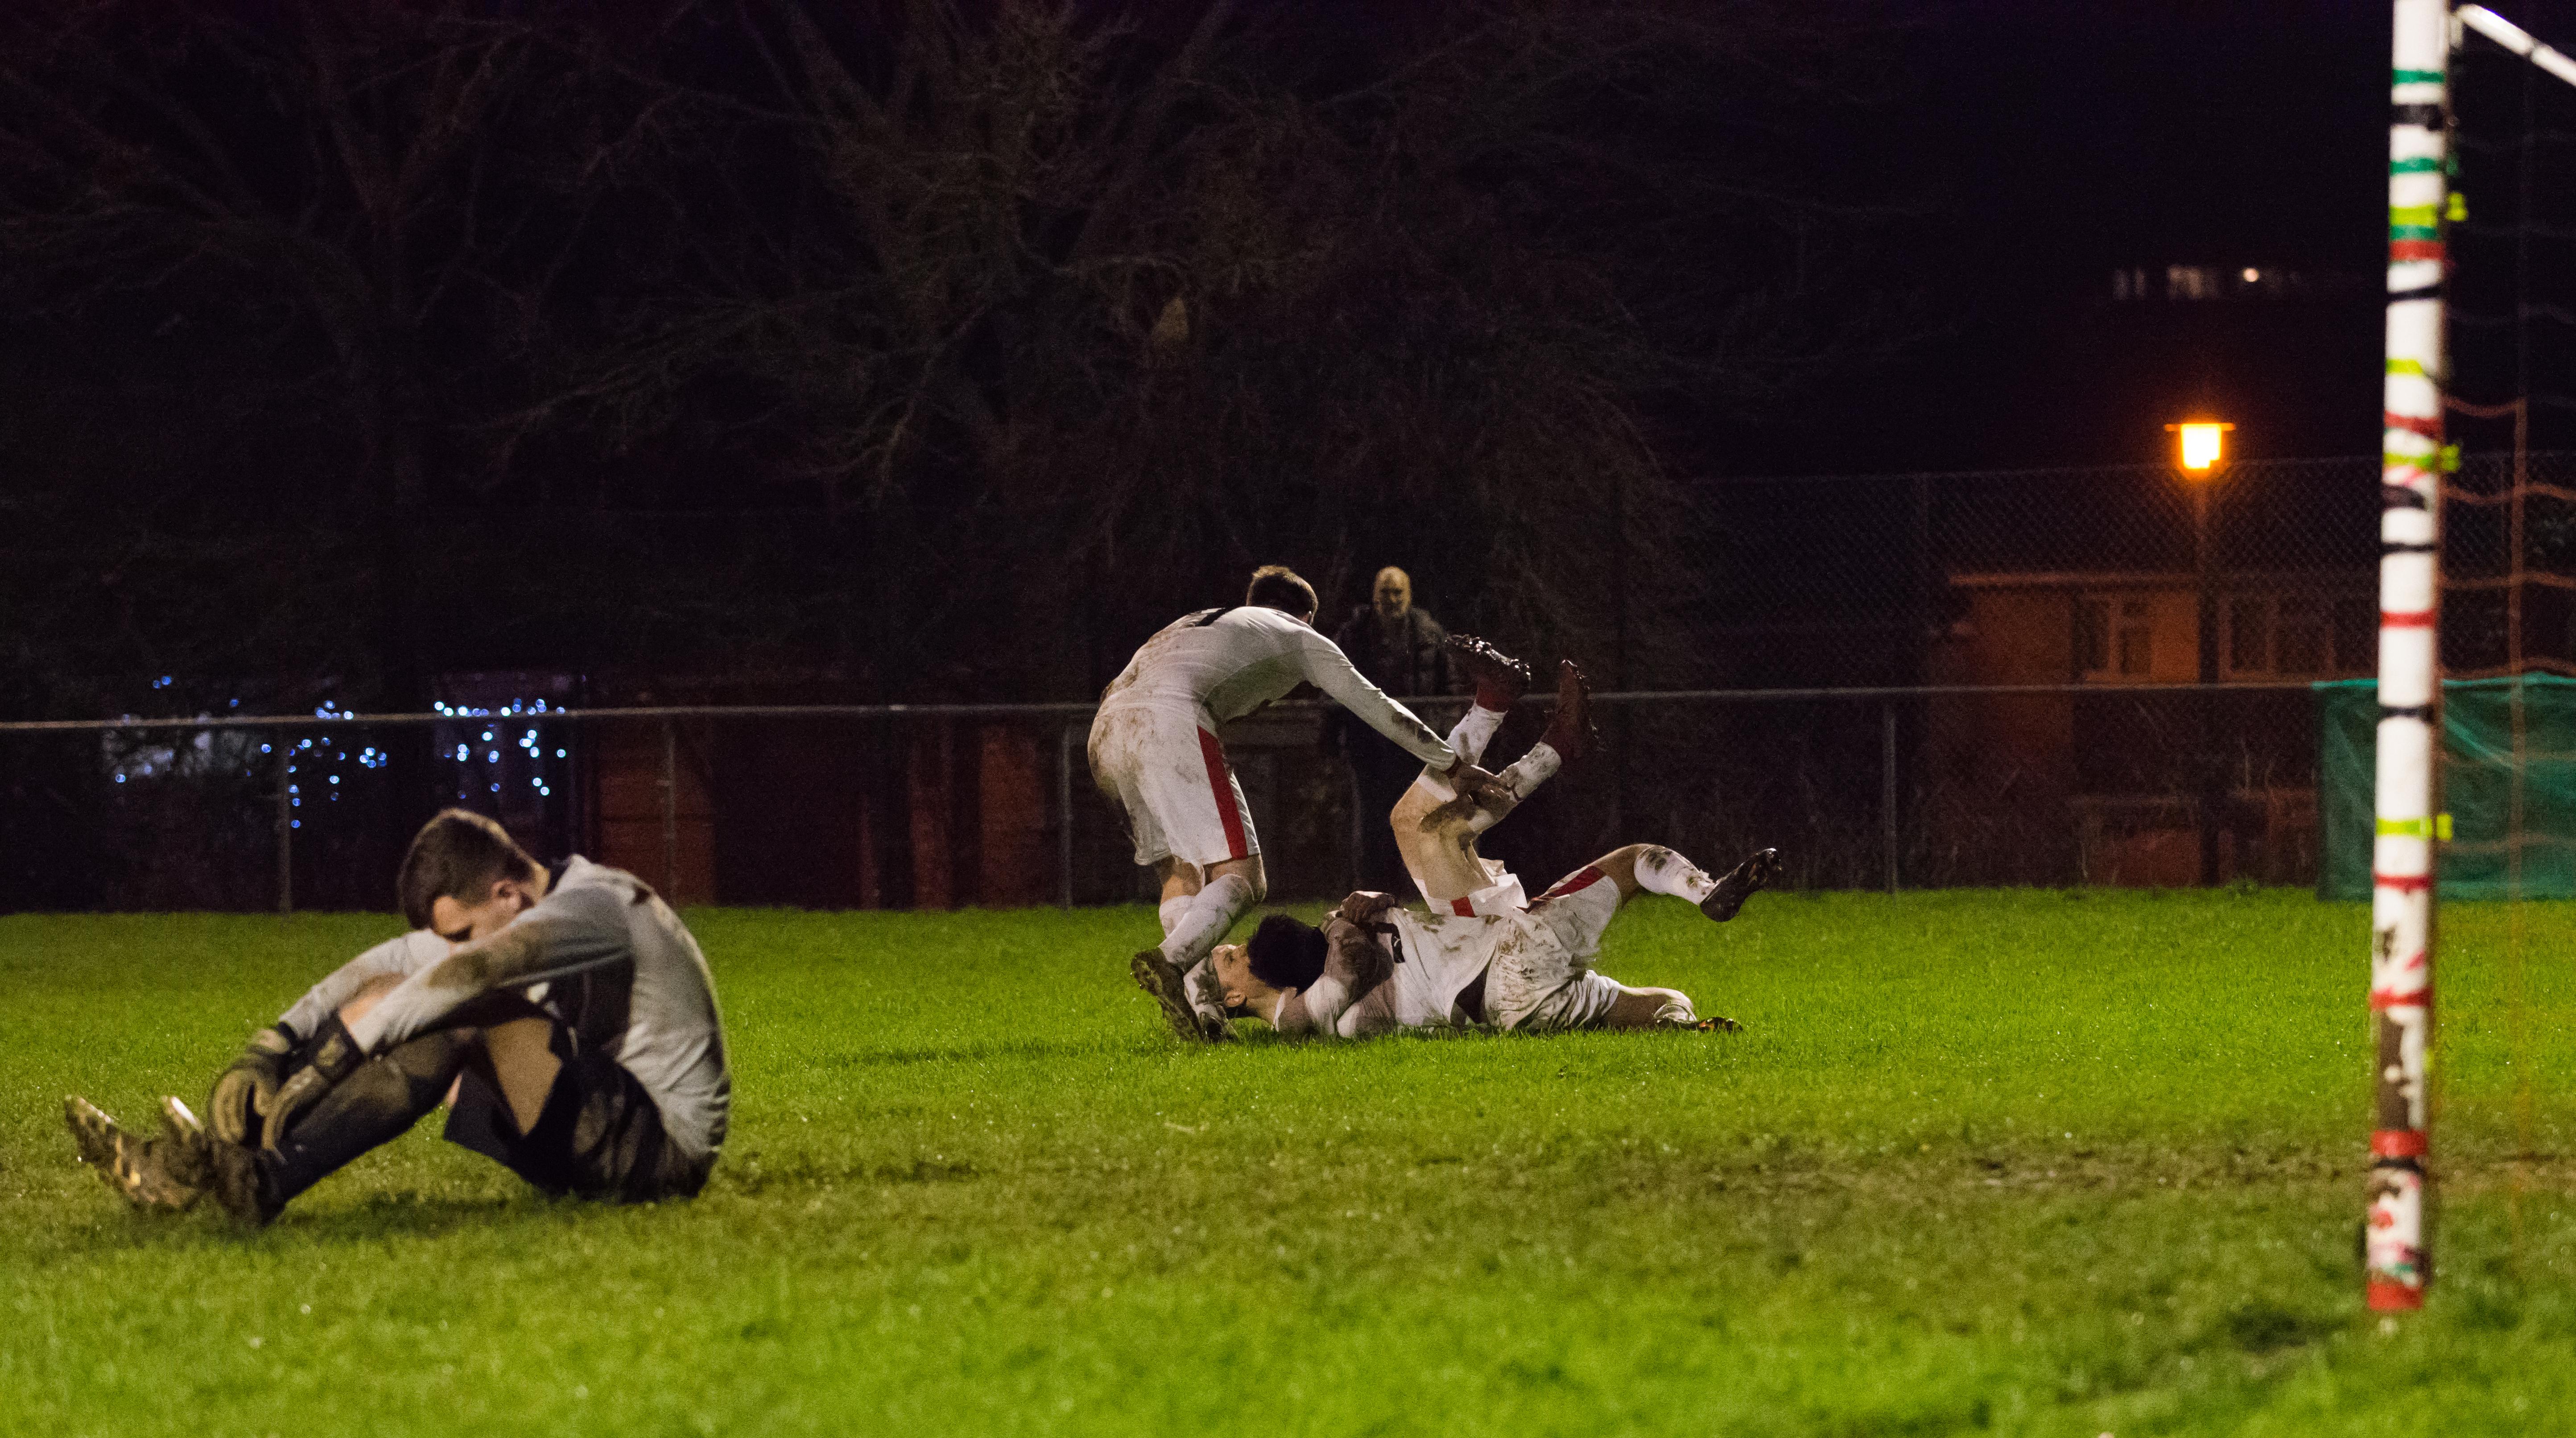 Mile Oak U21s vs Southwick FC U21s 14.12.17 50